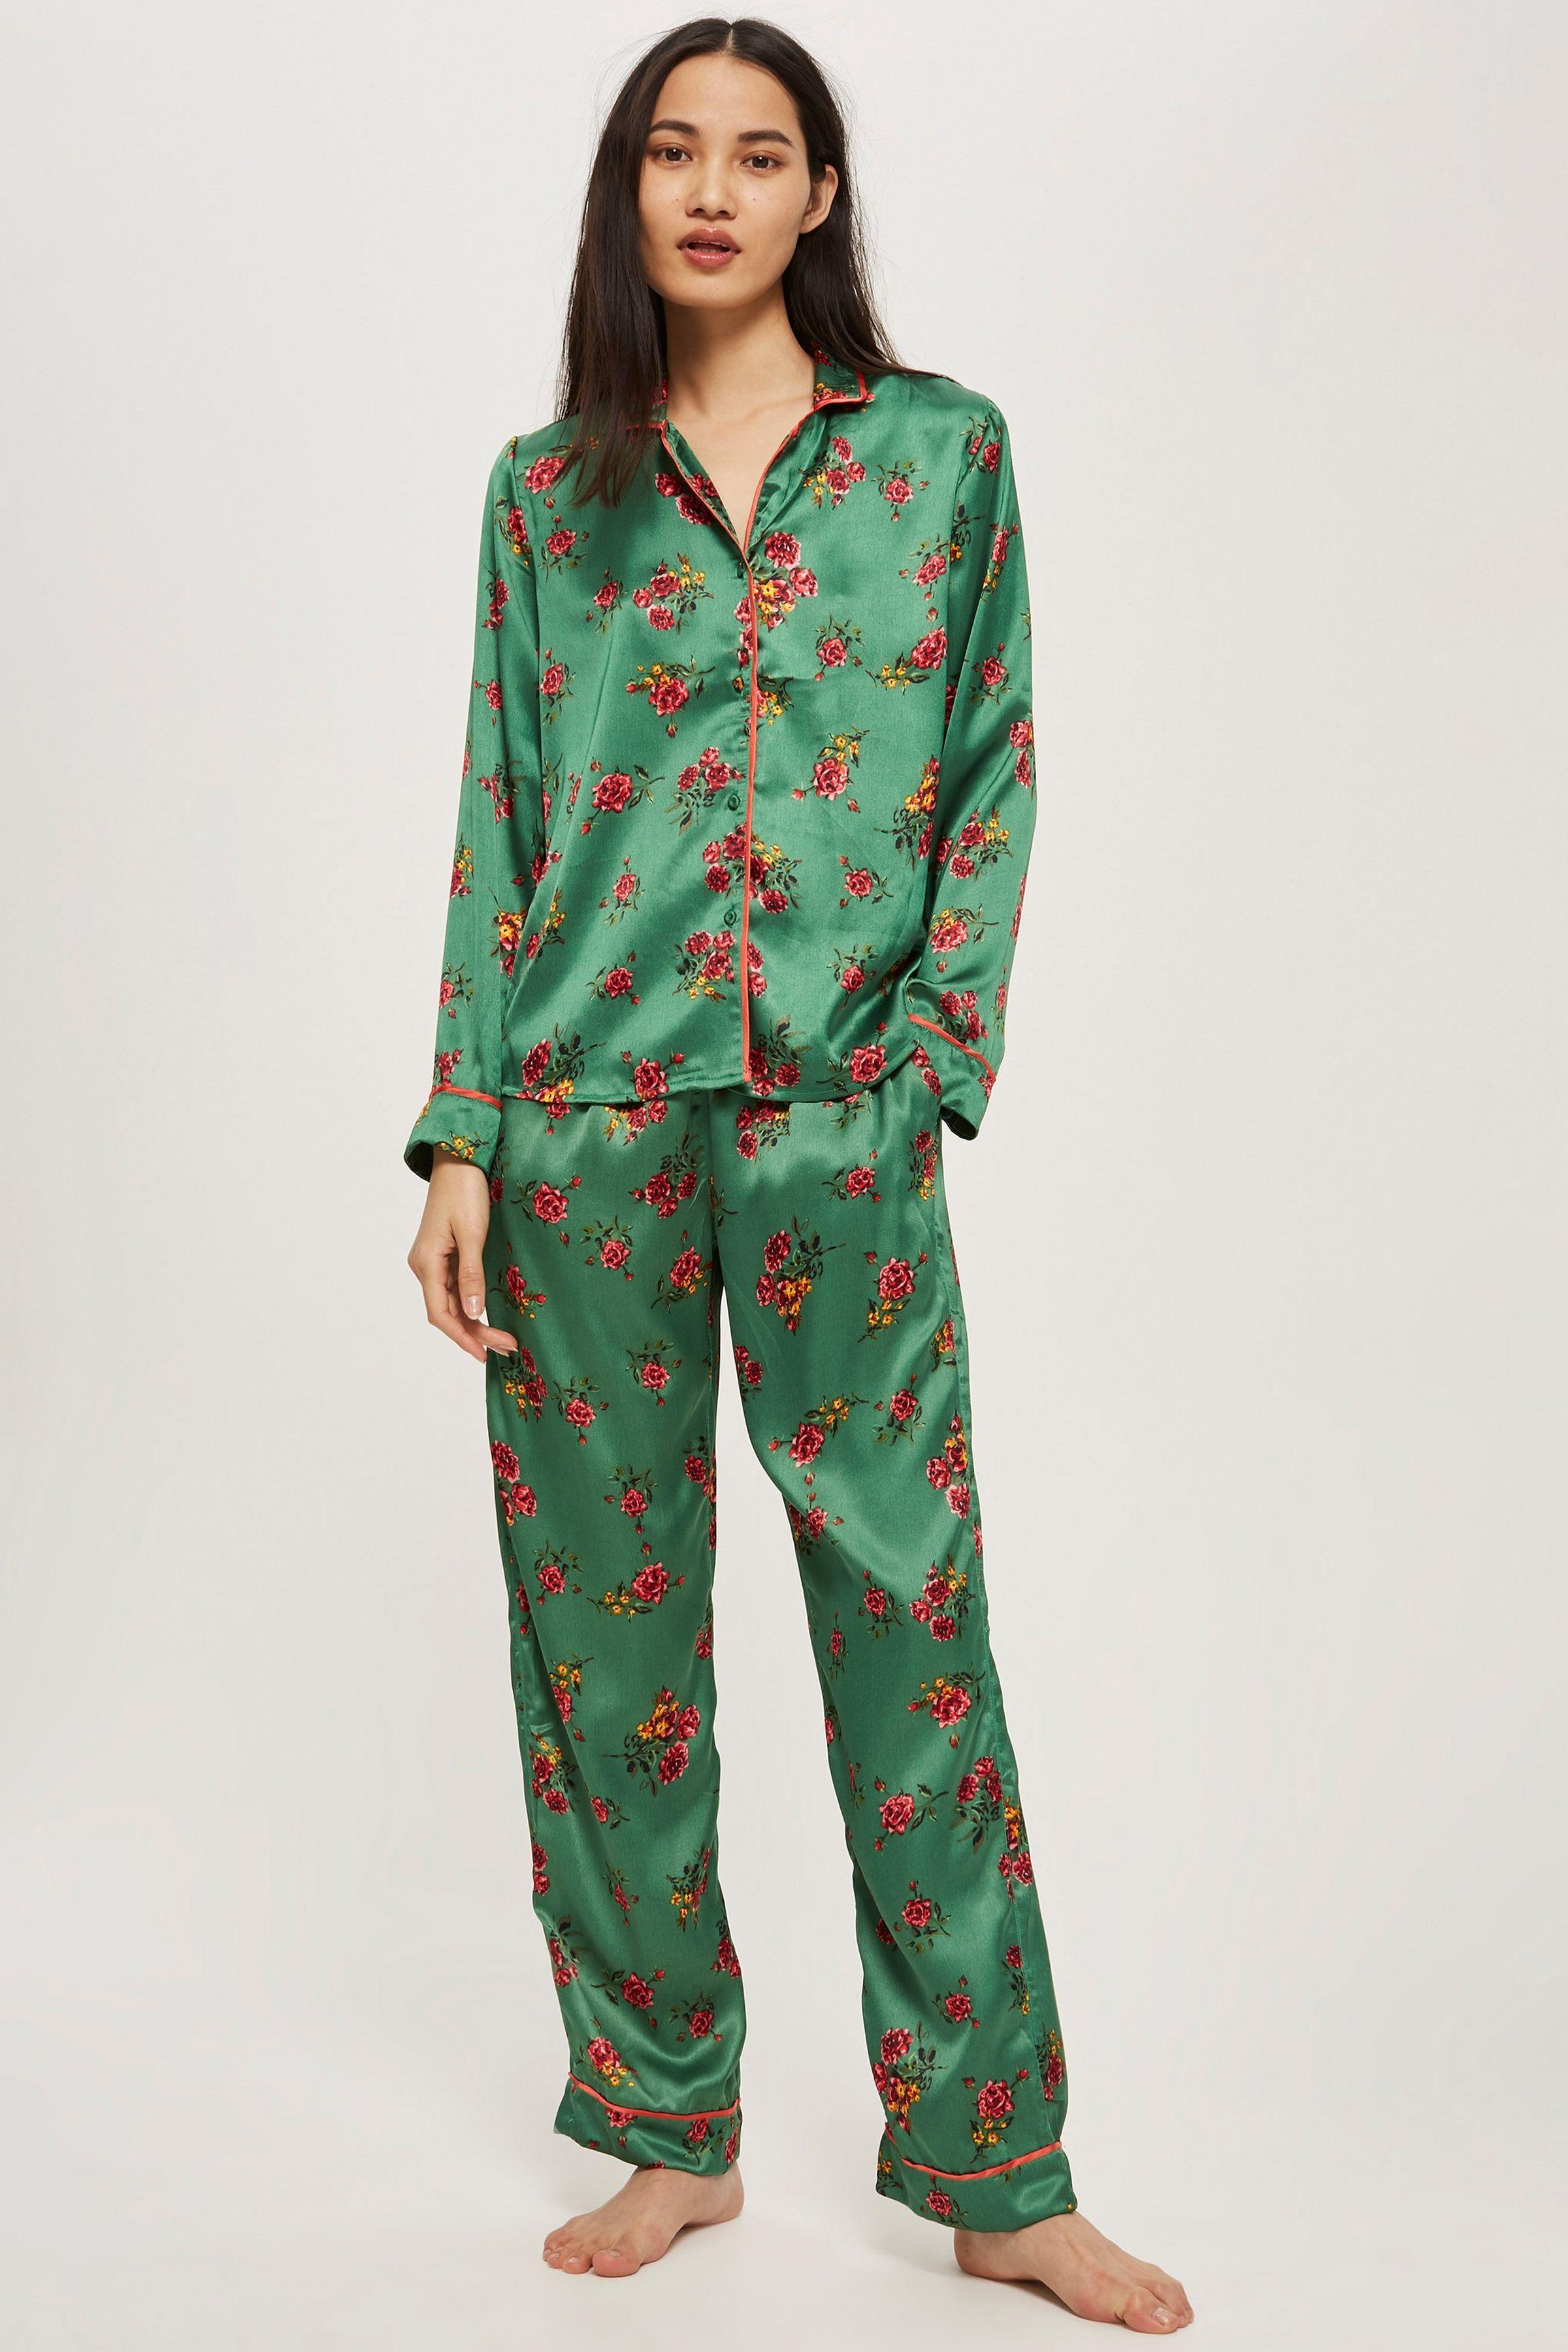 authentic finest fabrics no sale tax Green Satin Pyjama Set   pijama   Satin pyjama set, Satin ...